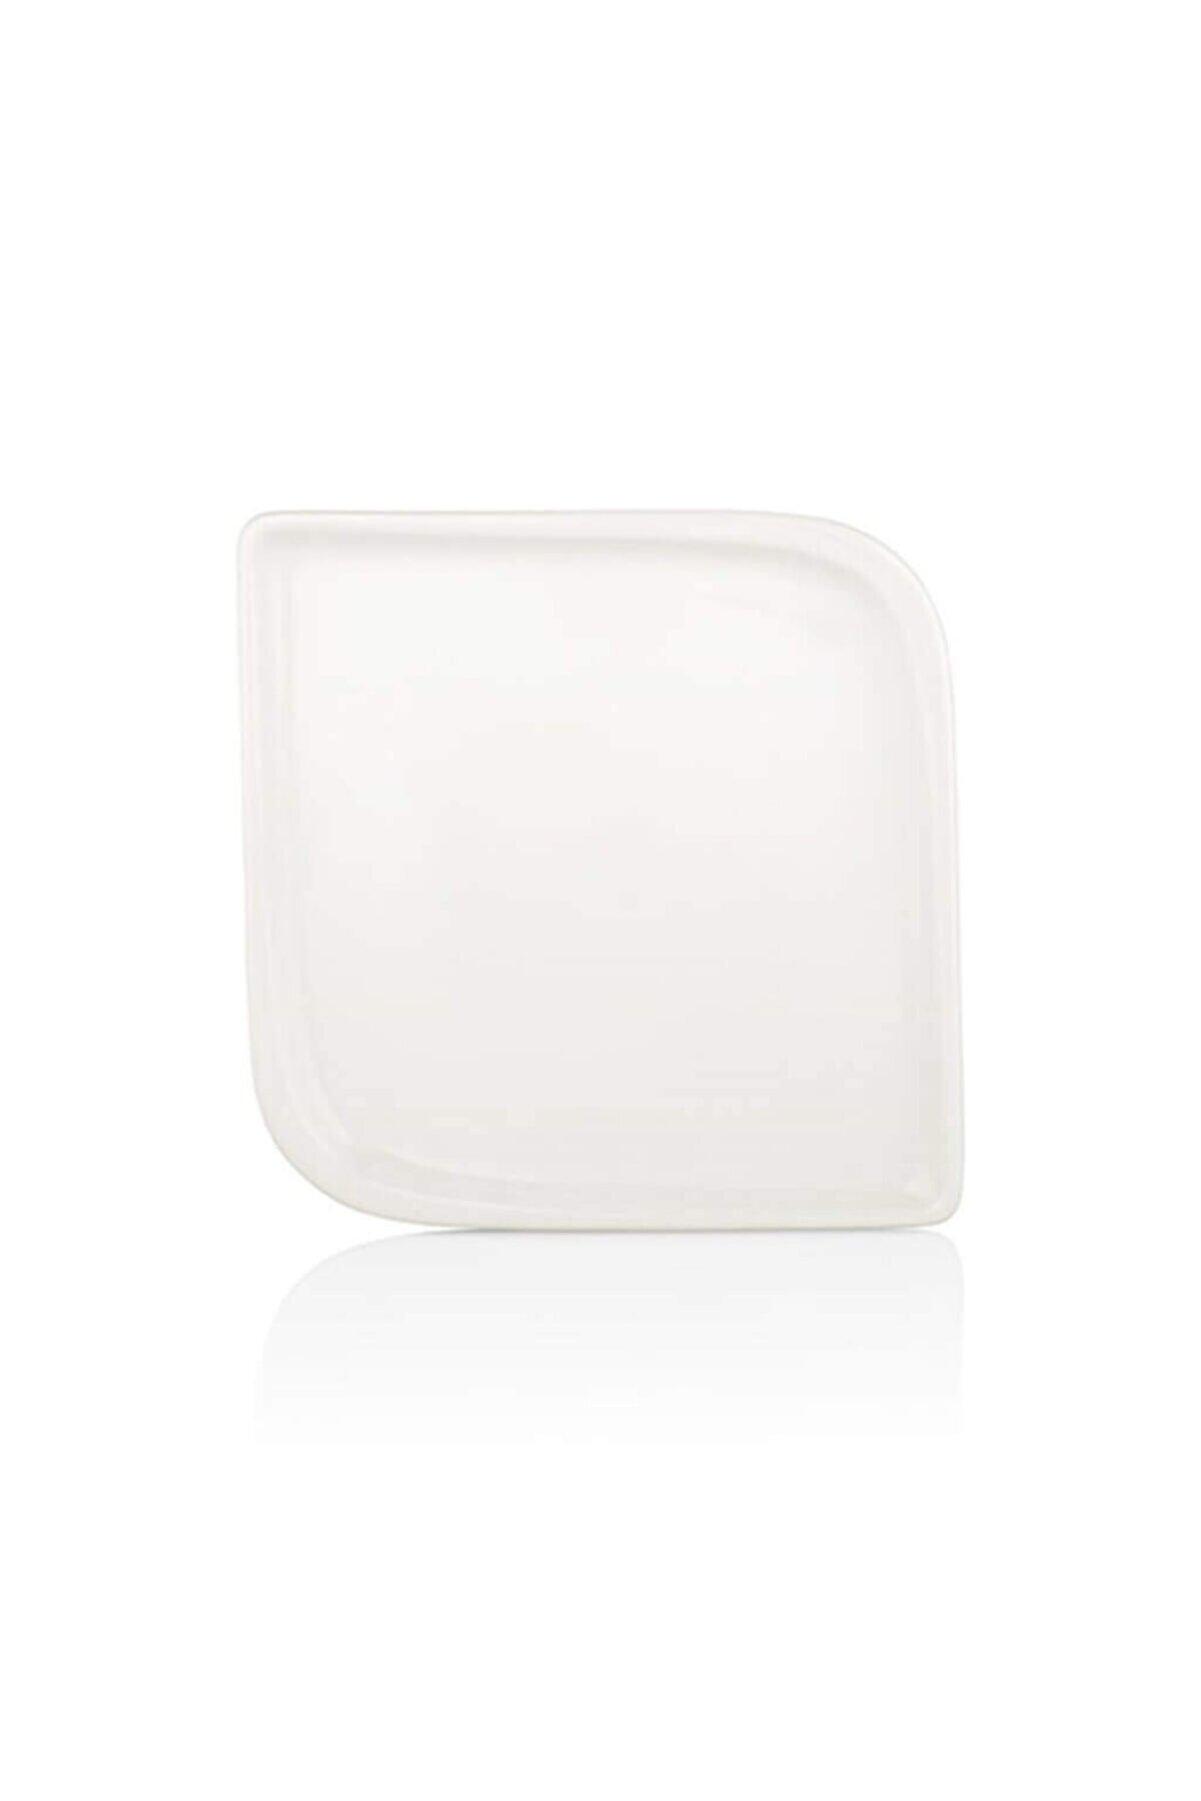 Sima Arel 20 Cm Kare Tabak-beyaz Porselen 12 Adet